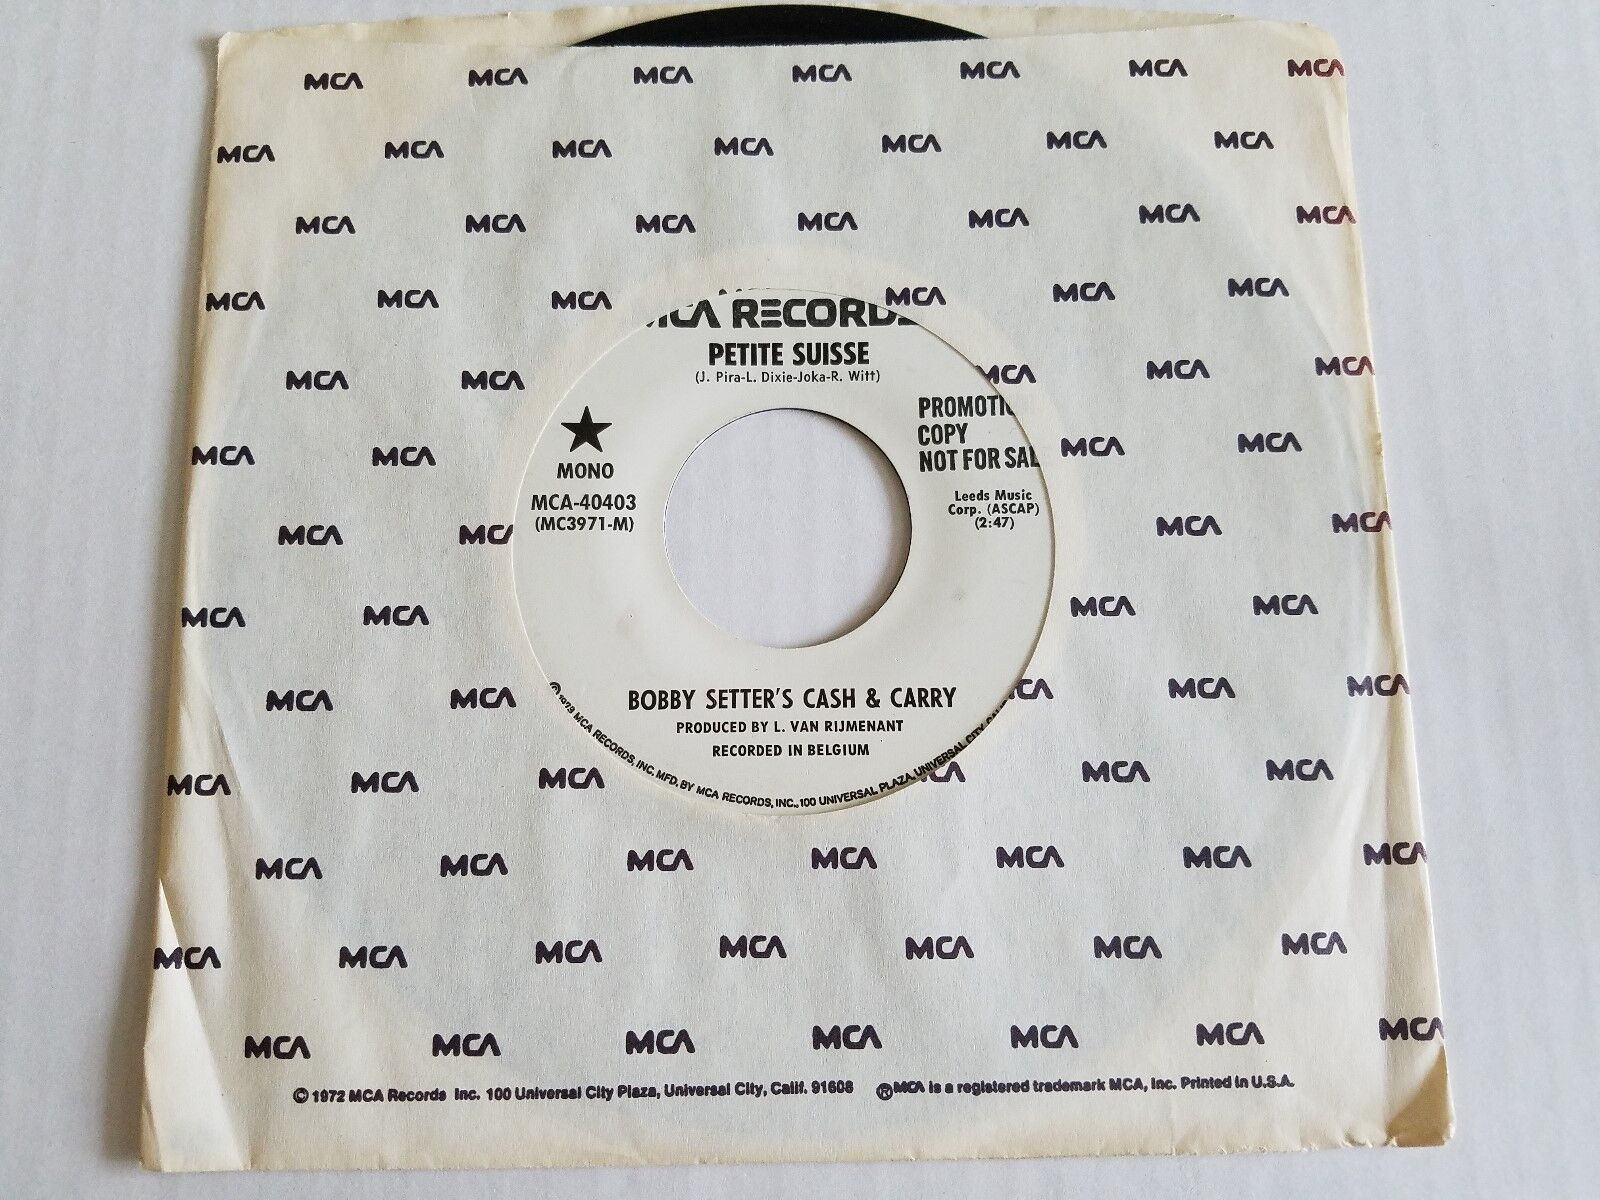 Bobby setter's cash & transporter - petite suisse 1975 synth-pop electro promo 7